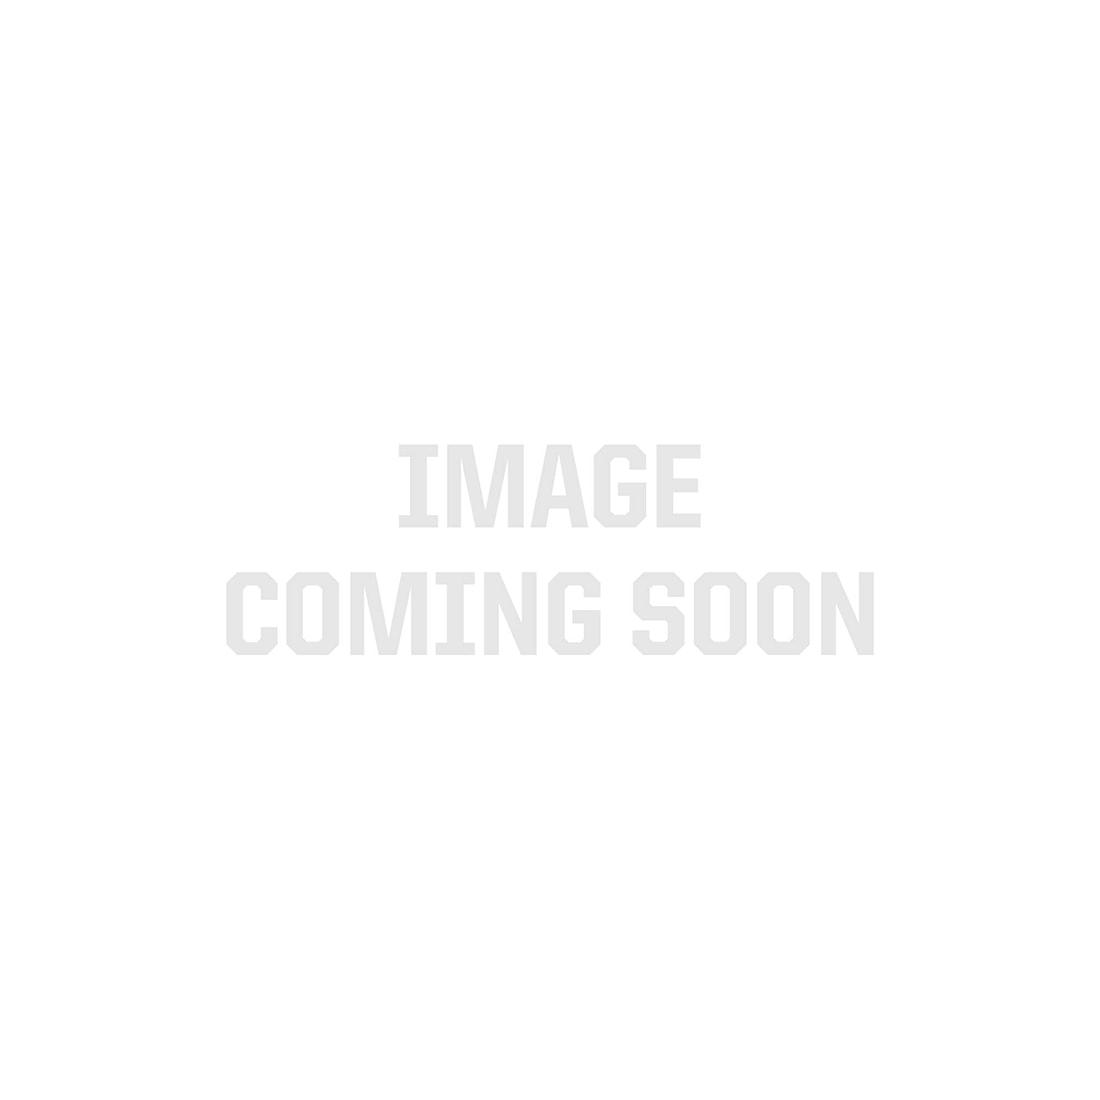 Kichler Design Pro LED 6.9 inch Hardscape Light Flat Mount Bracket (4-Pack)